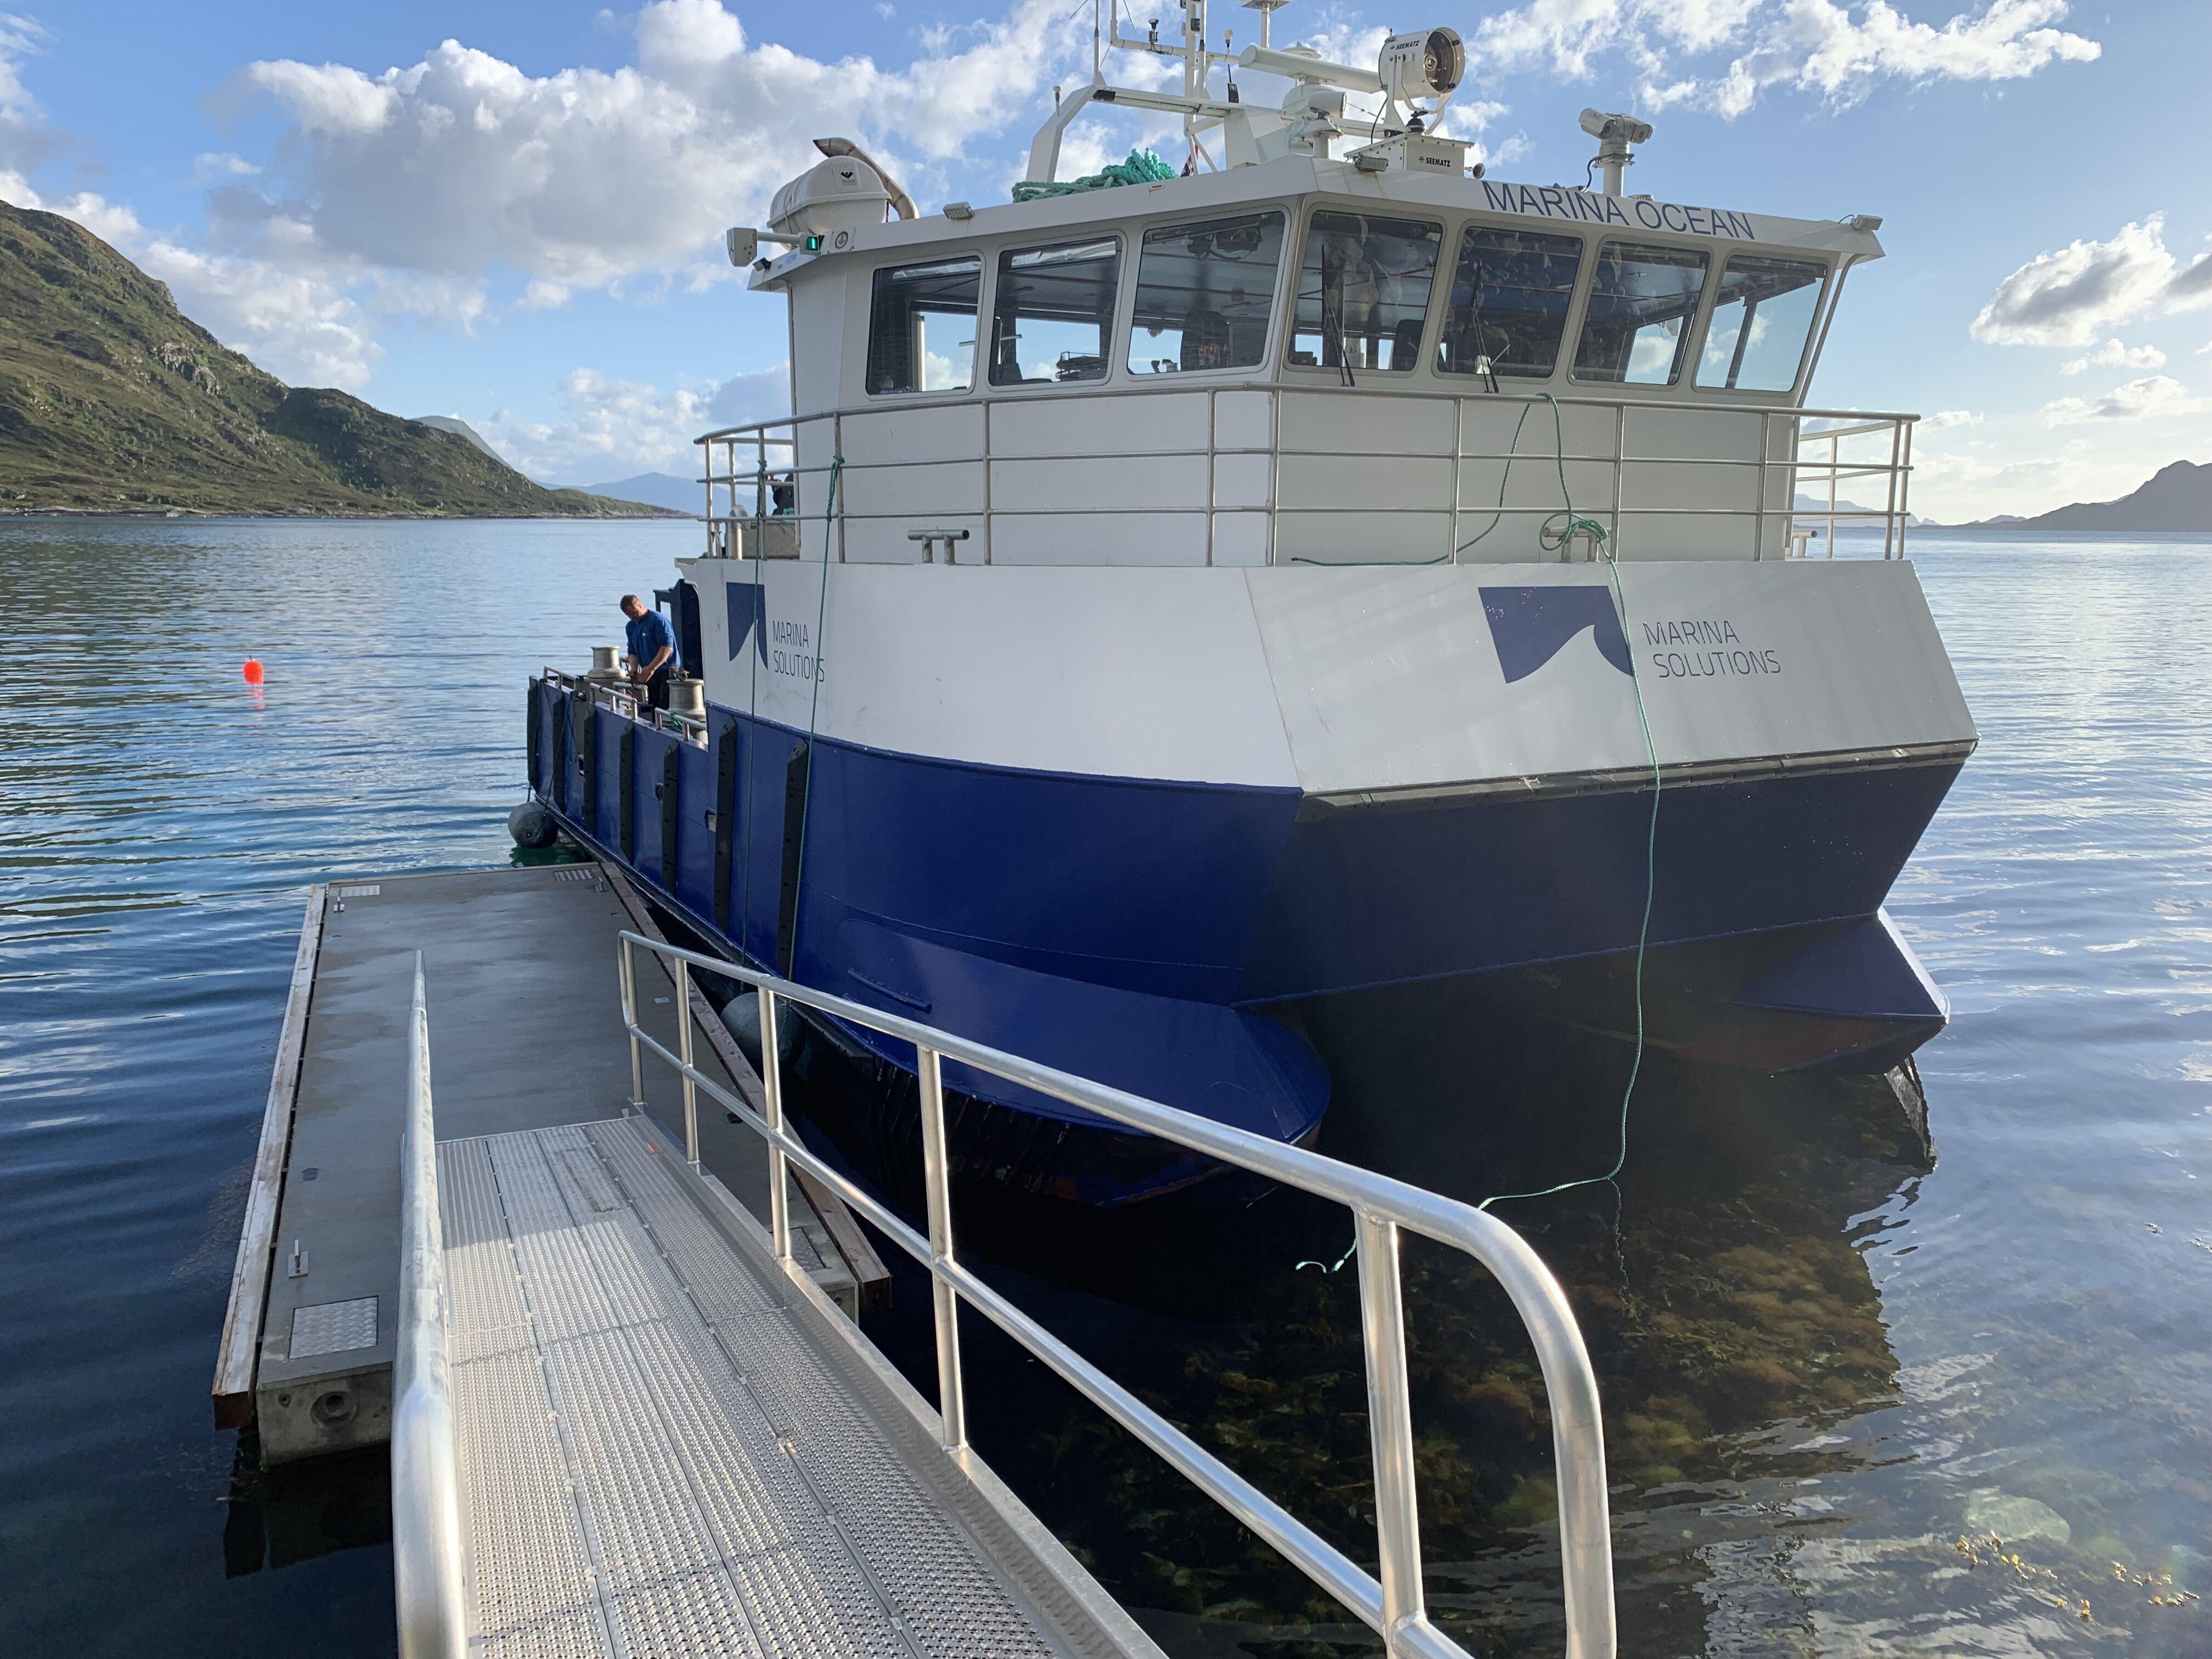 https://www.marinasolutions.no/uploads/Haugsbygda-Gursken-Larsnes-landstedsbrygge-Marina-Ocean.jpeg